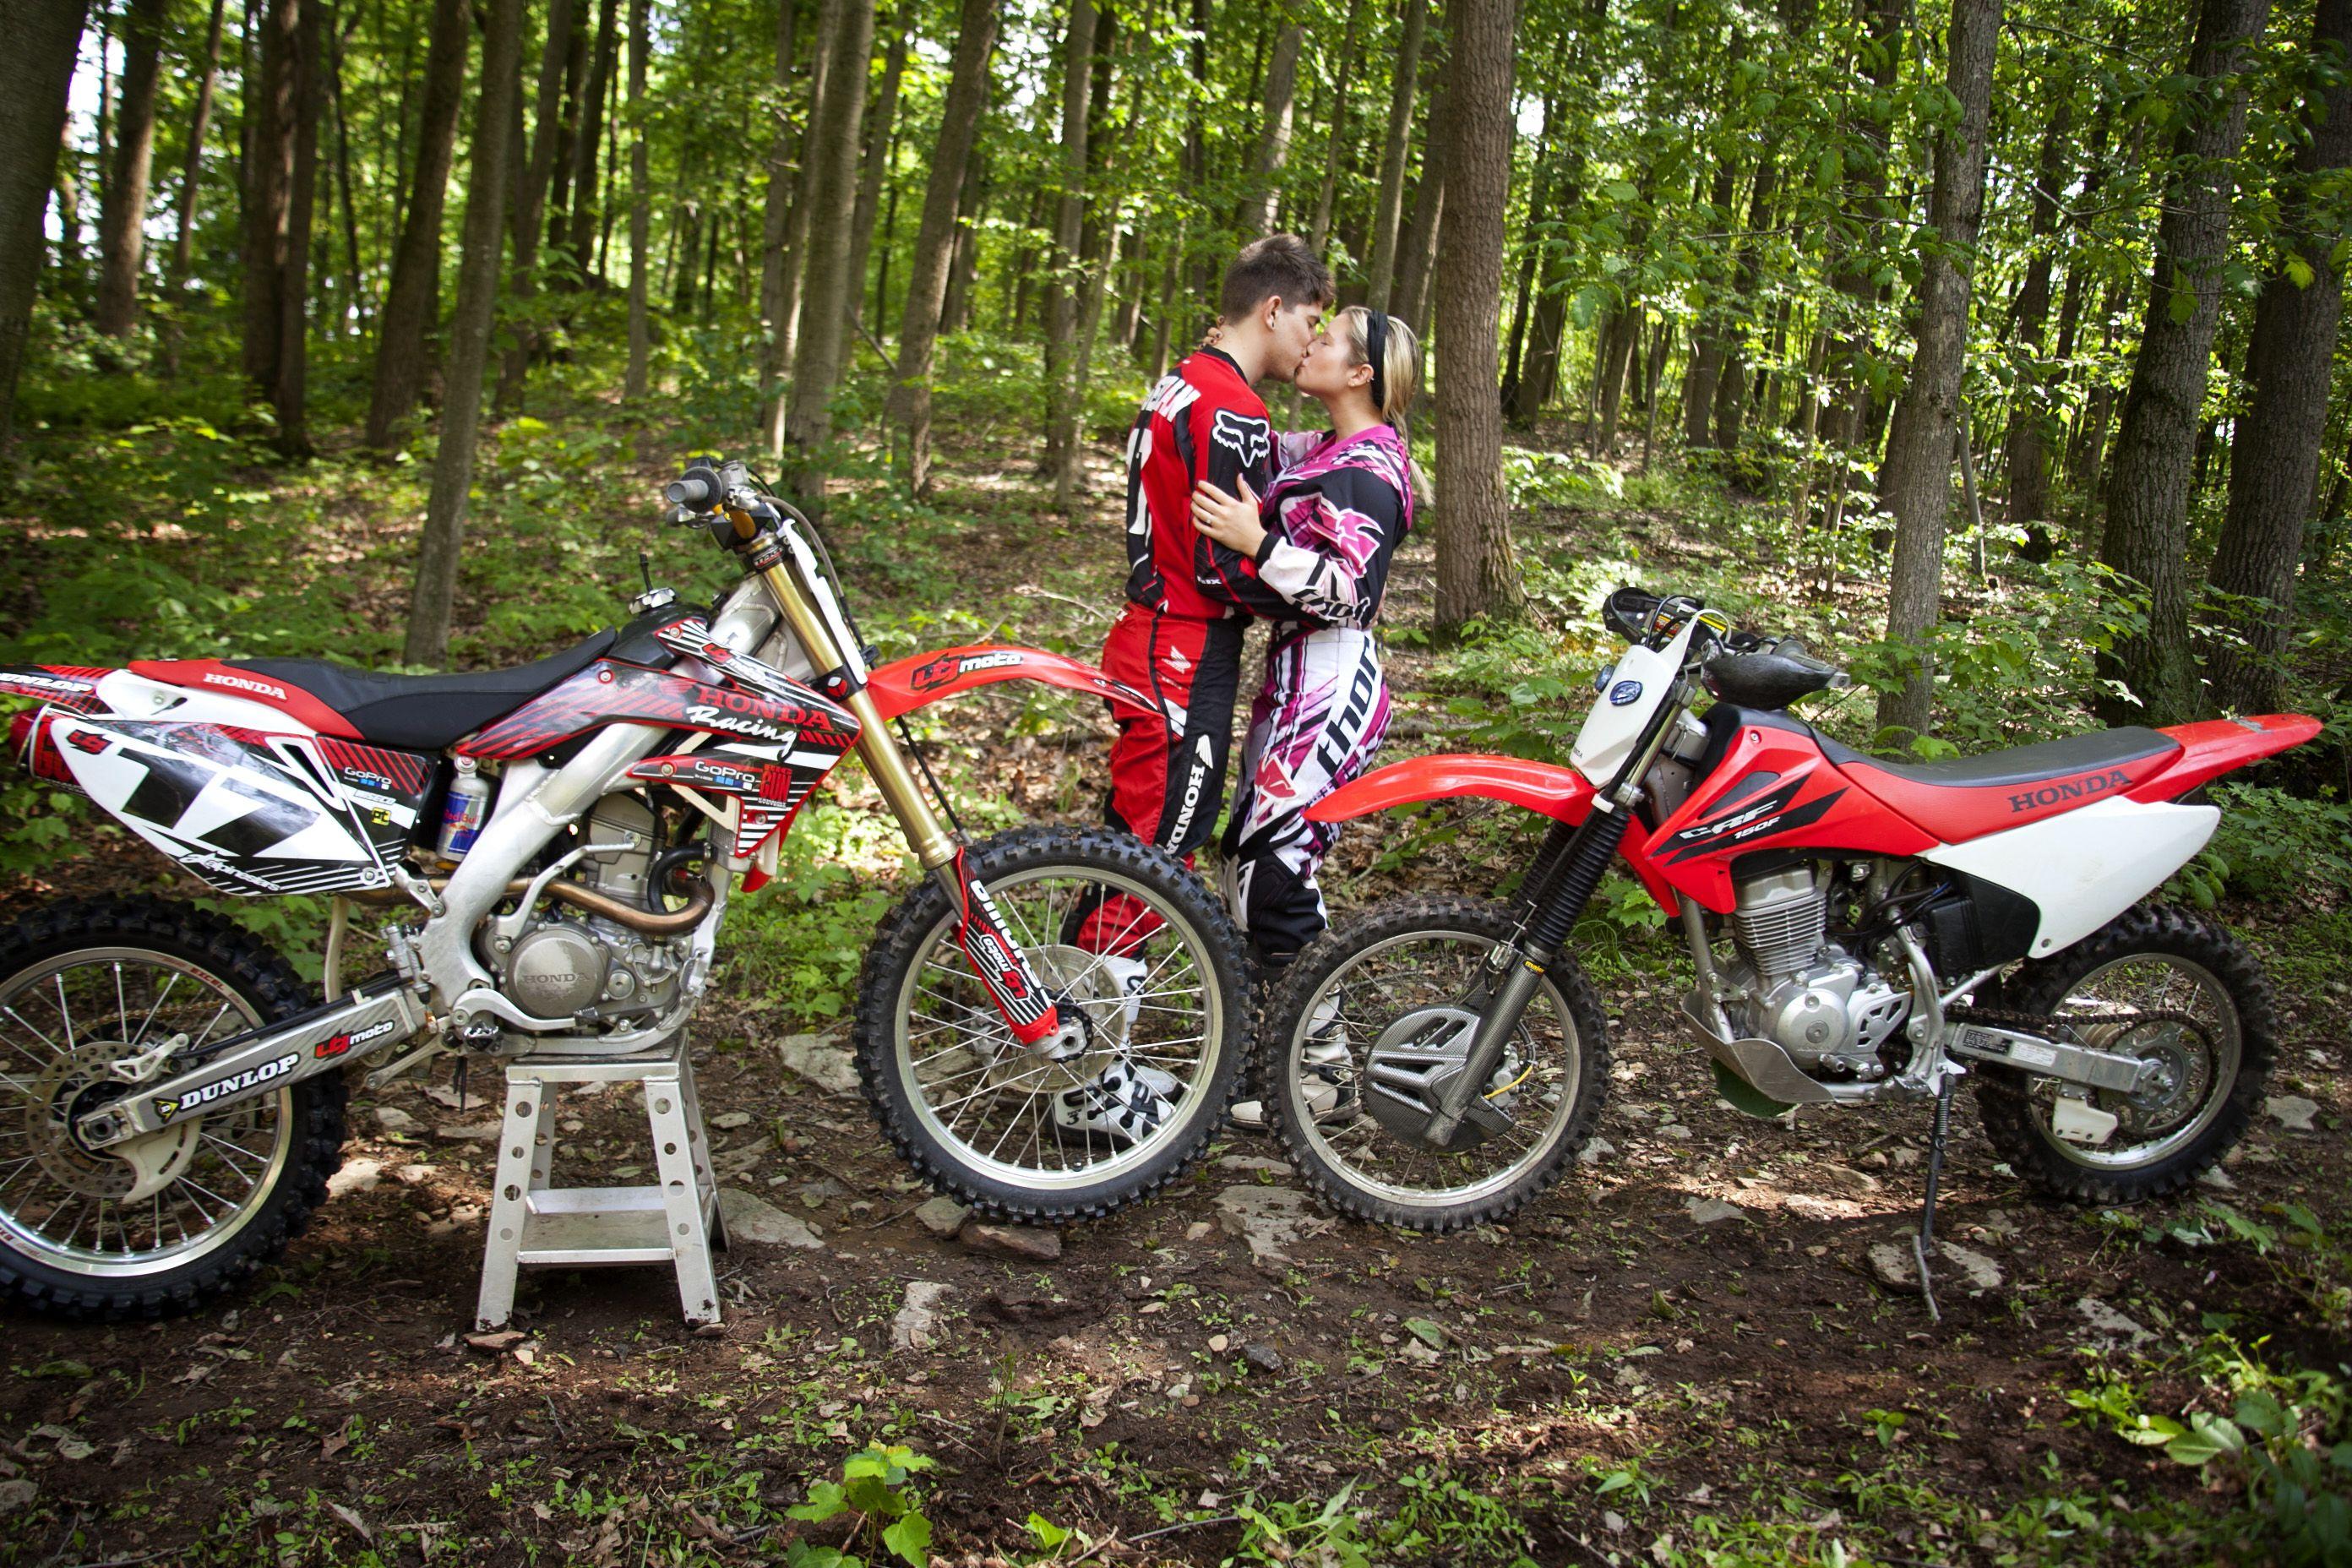 Dirt Bike Love Engagement Shoot With Dirt Bikes Kissing Bikes